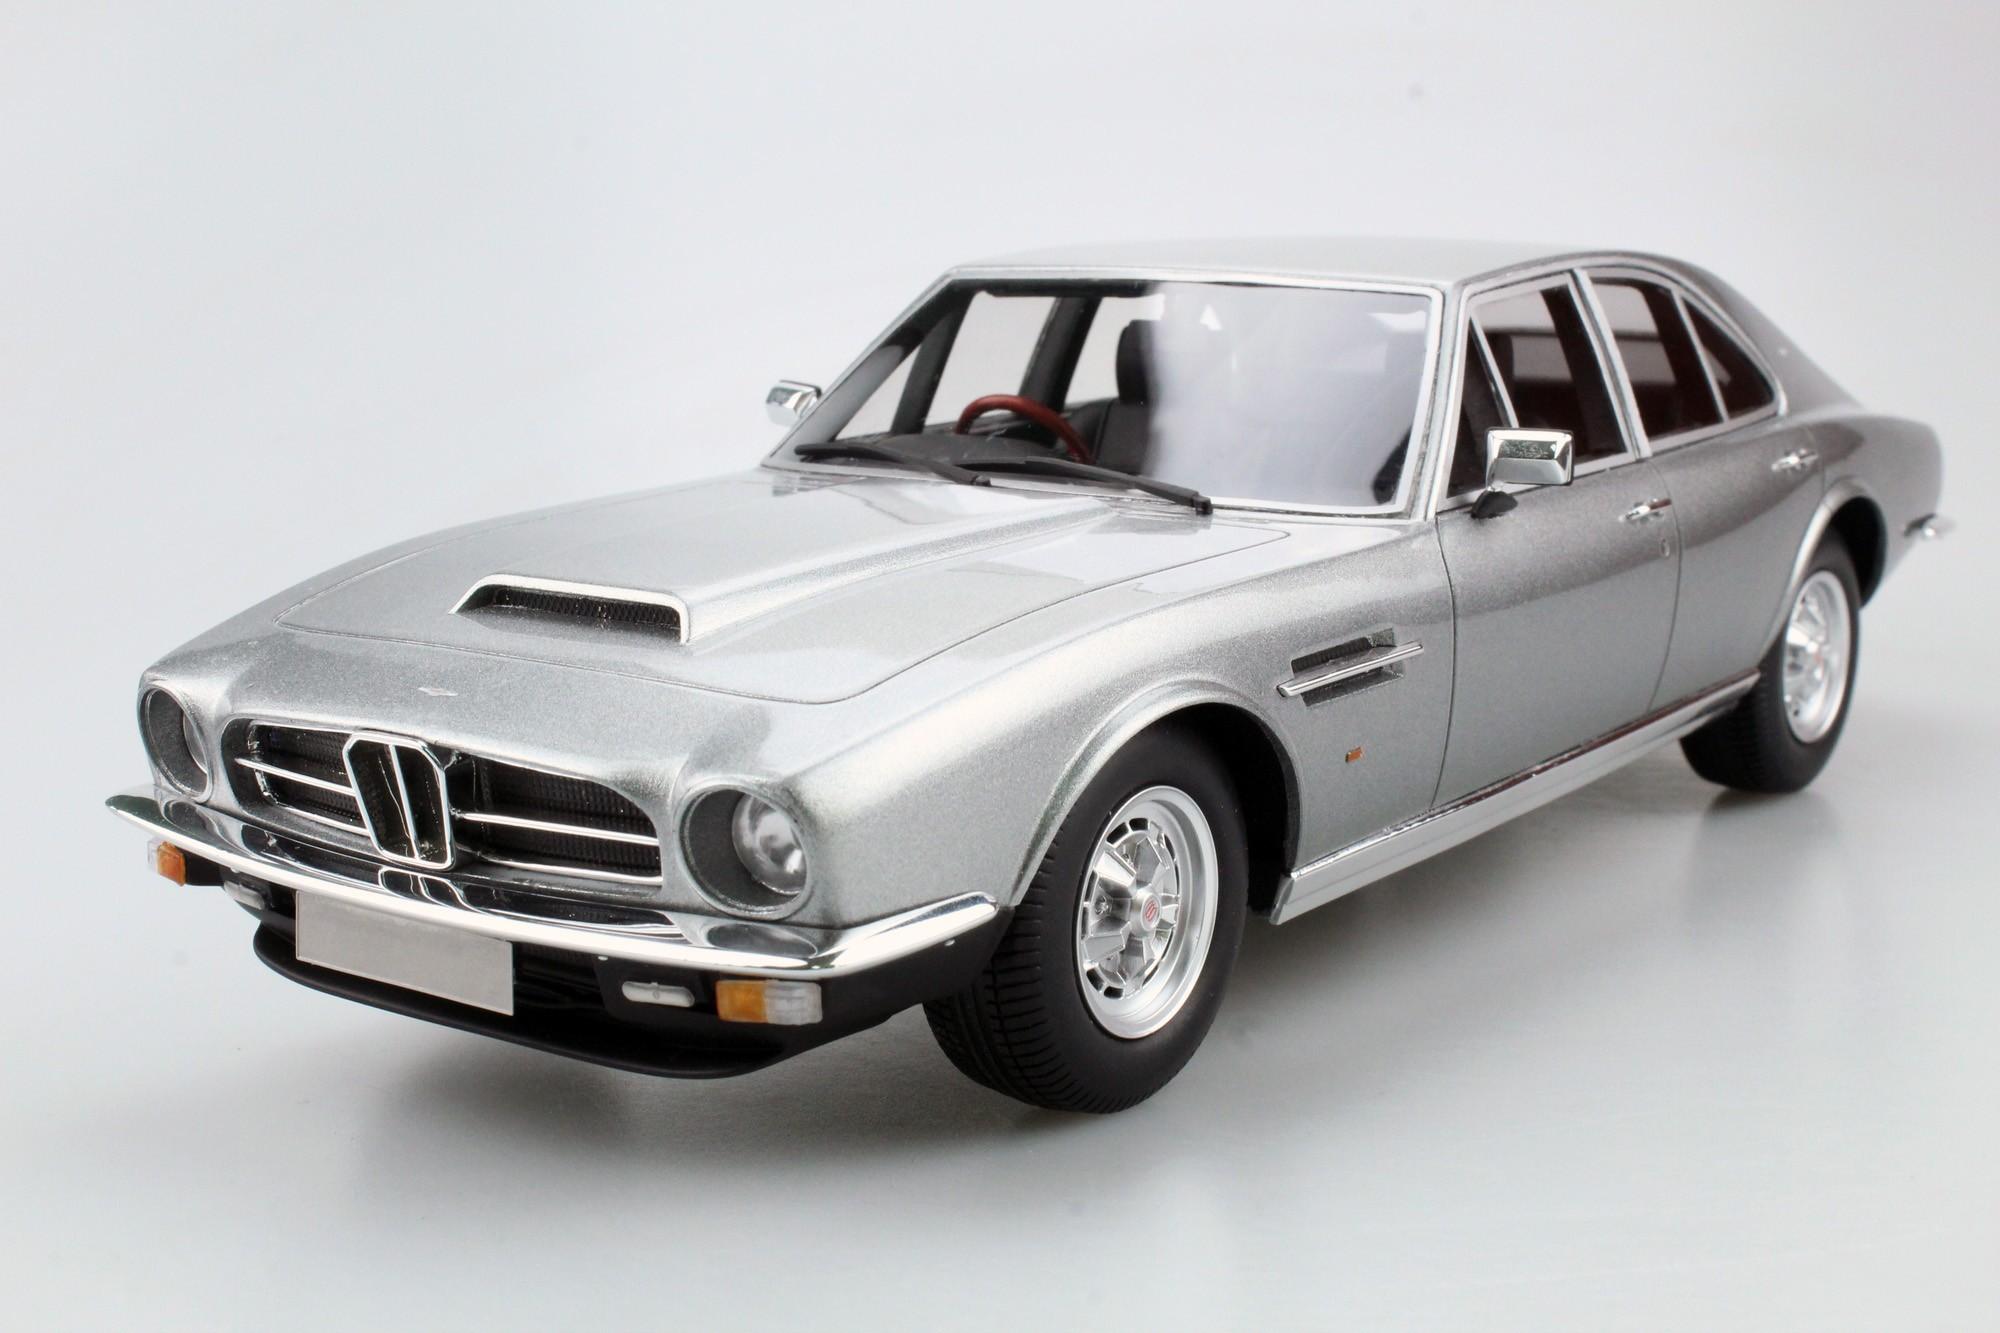 Ls Collectibles Aston Martin Lagonda 1974 Saloon 1 18 Silber Ls024b